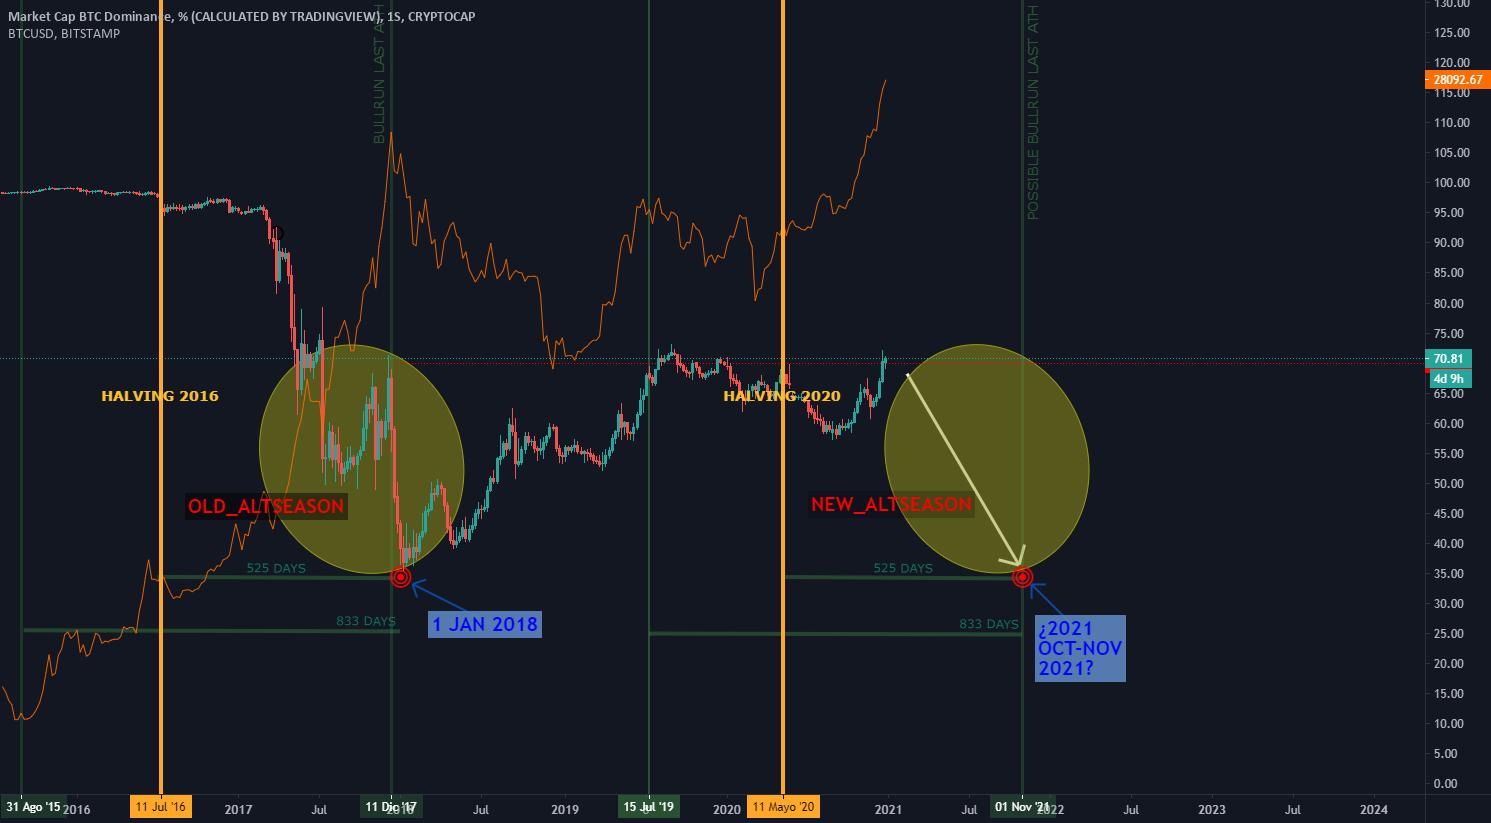 pelnas dabar i bitkoin ir altkoin 2021 m)